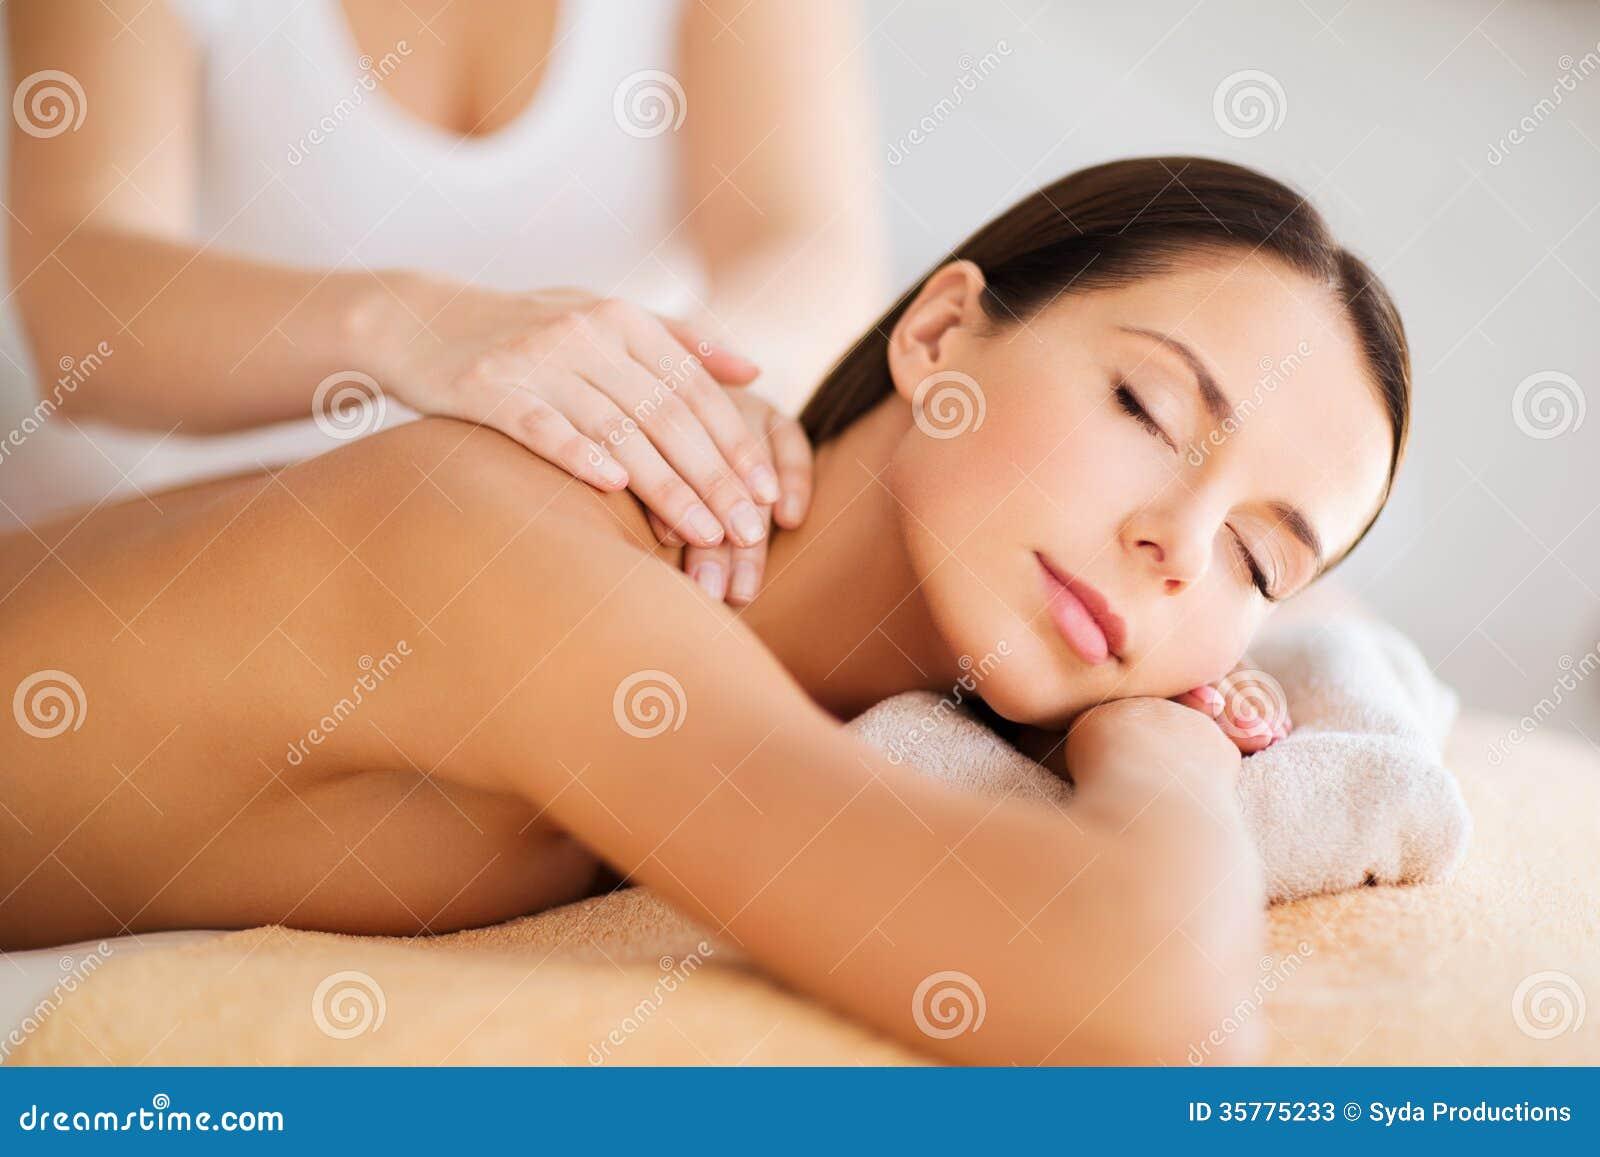 Beautiful woman in spa having massage